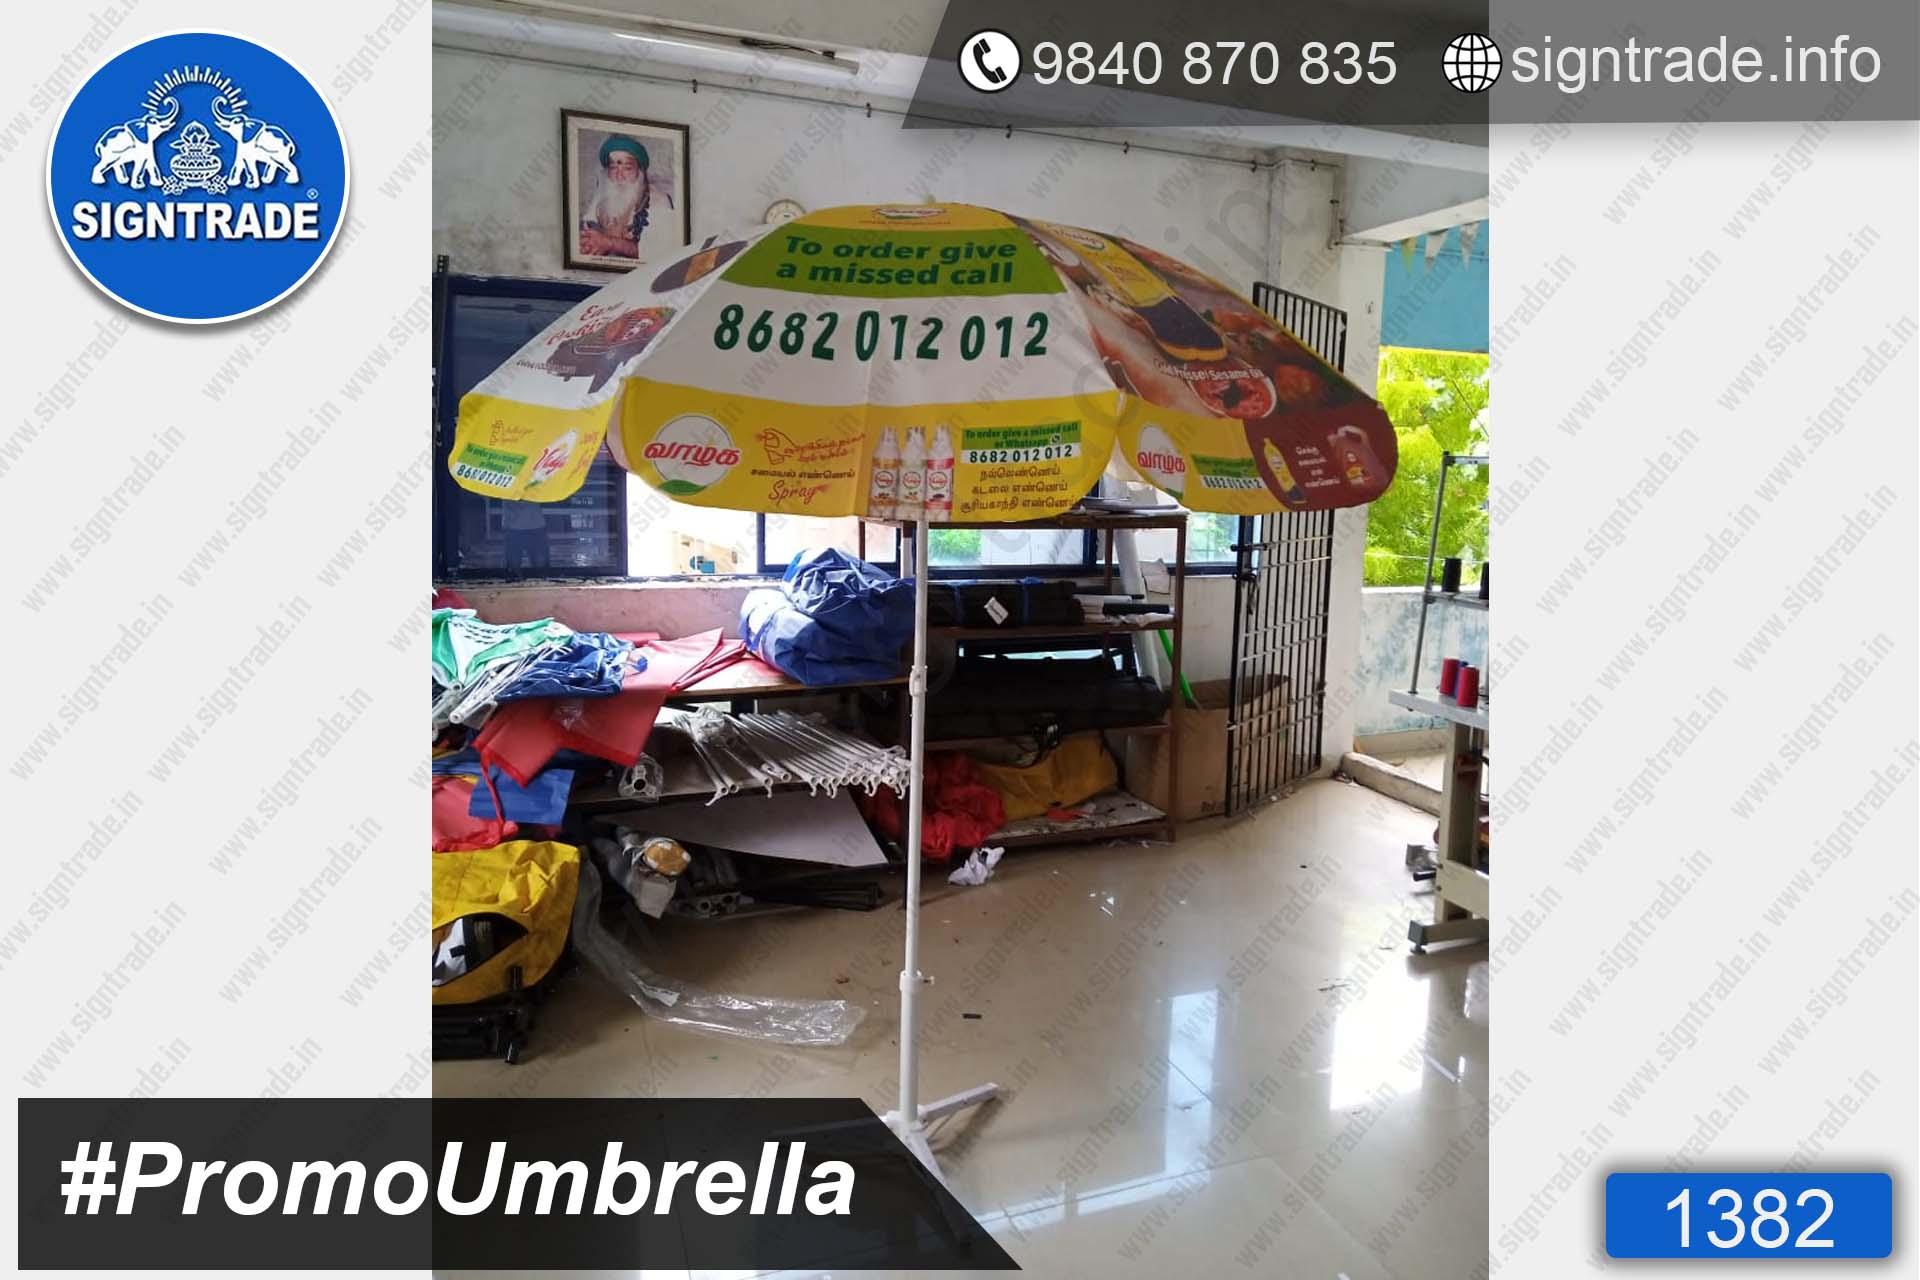 Vaalga Cooking Oil Spray - 1382, Promotional Umbrella, Umbrella, Promo Umbrella, Advertising Umbrella, Big Umbrella, Large Umbrella, Printed Umbrella